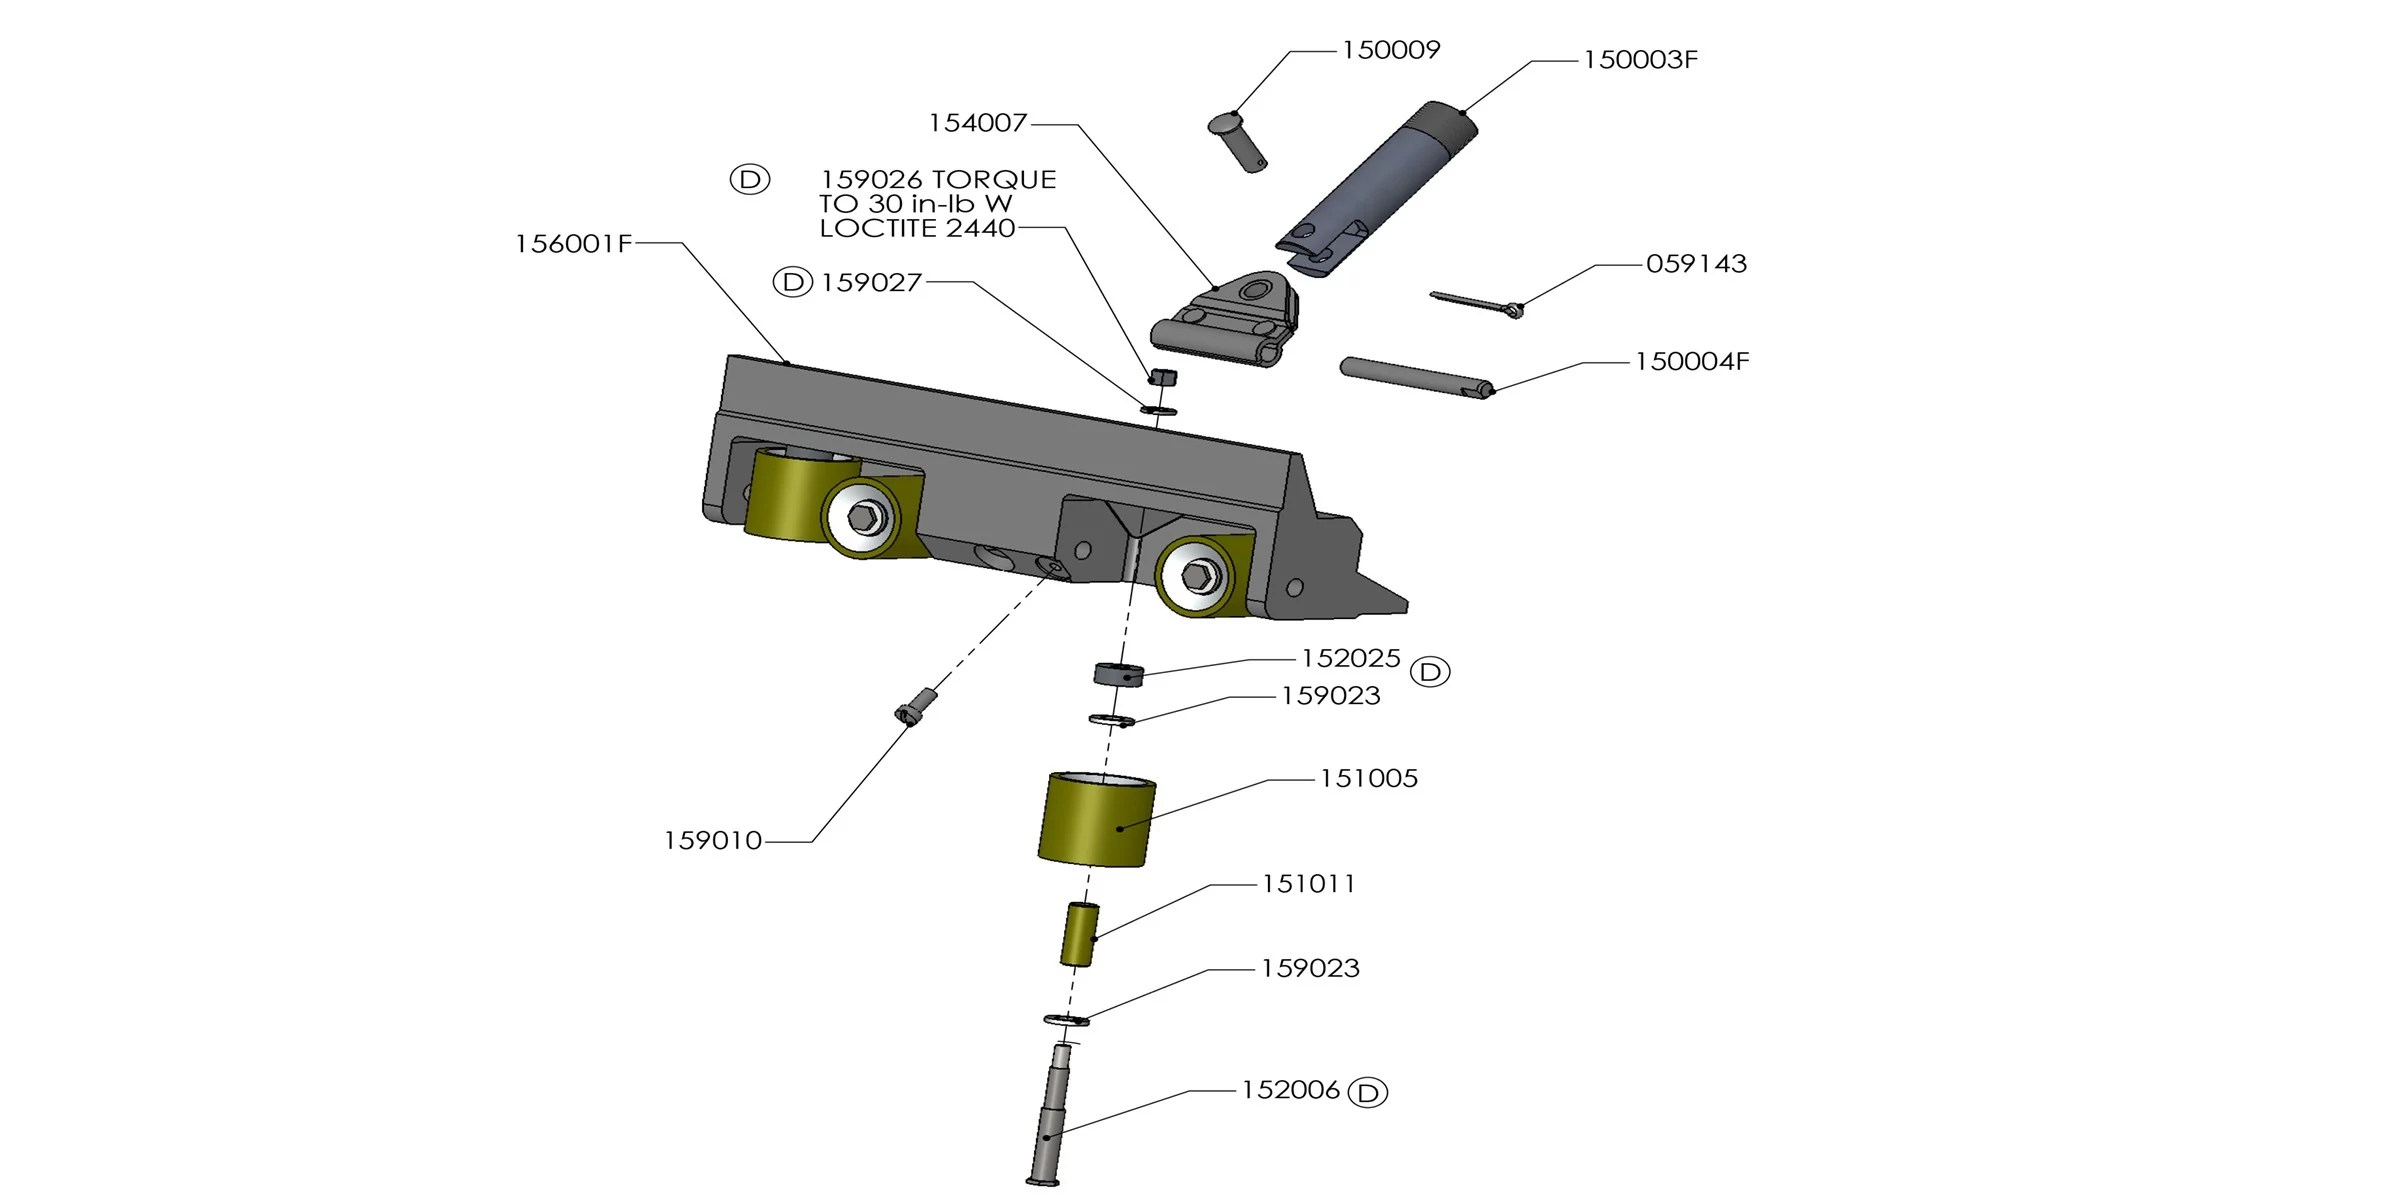 Tapetech Bazooka Parts Diagram